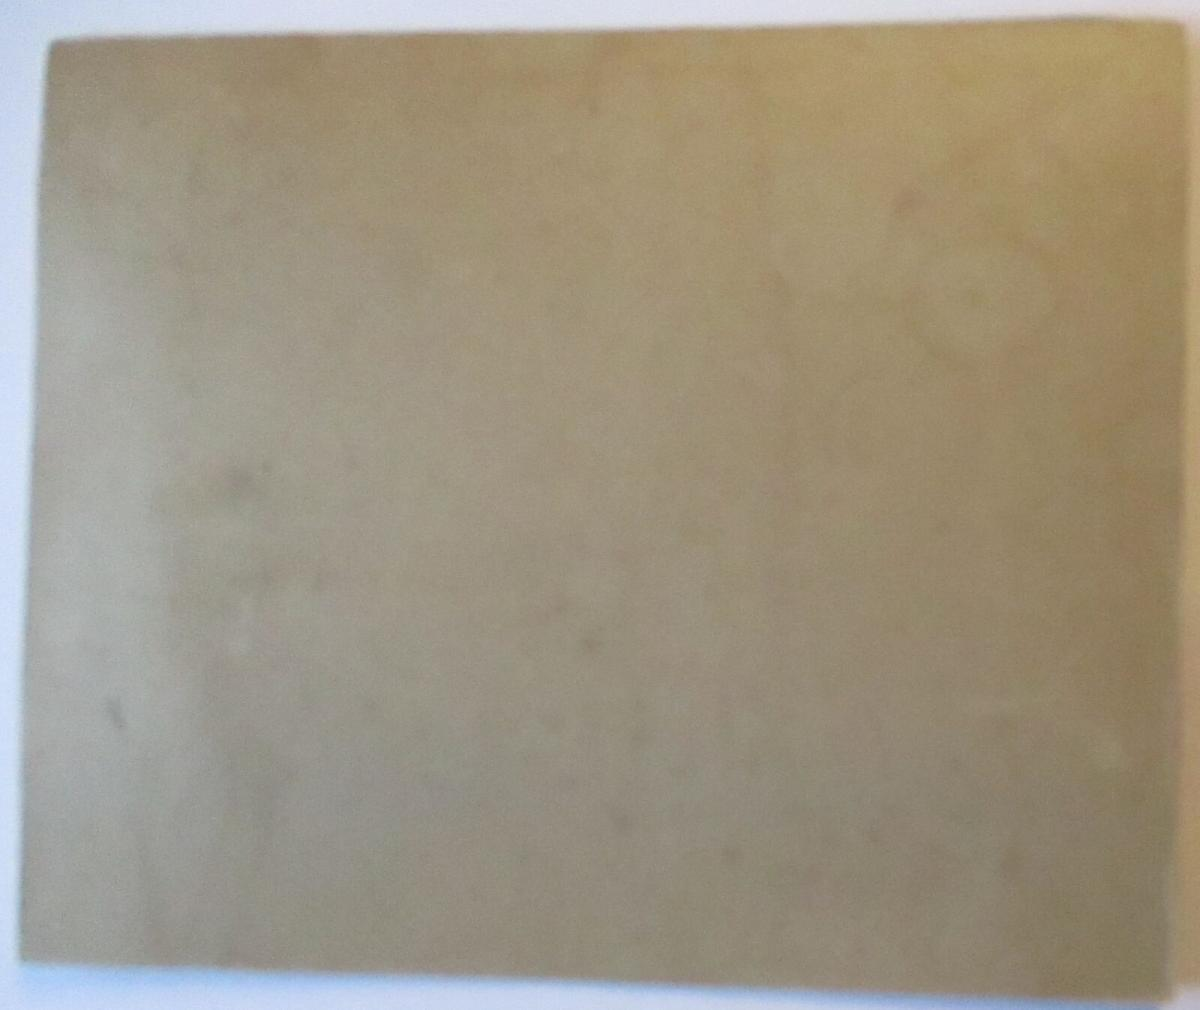 Junge Männer, original Foto 14x10 cm auf Pappe ca. 1900 (22879) 1